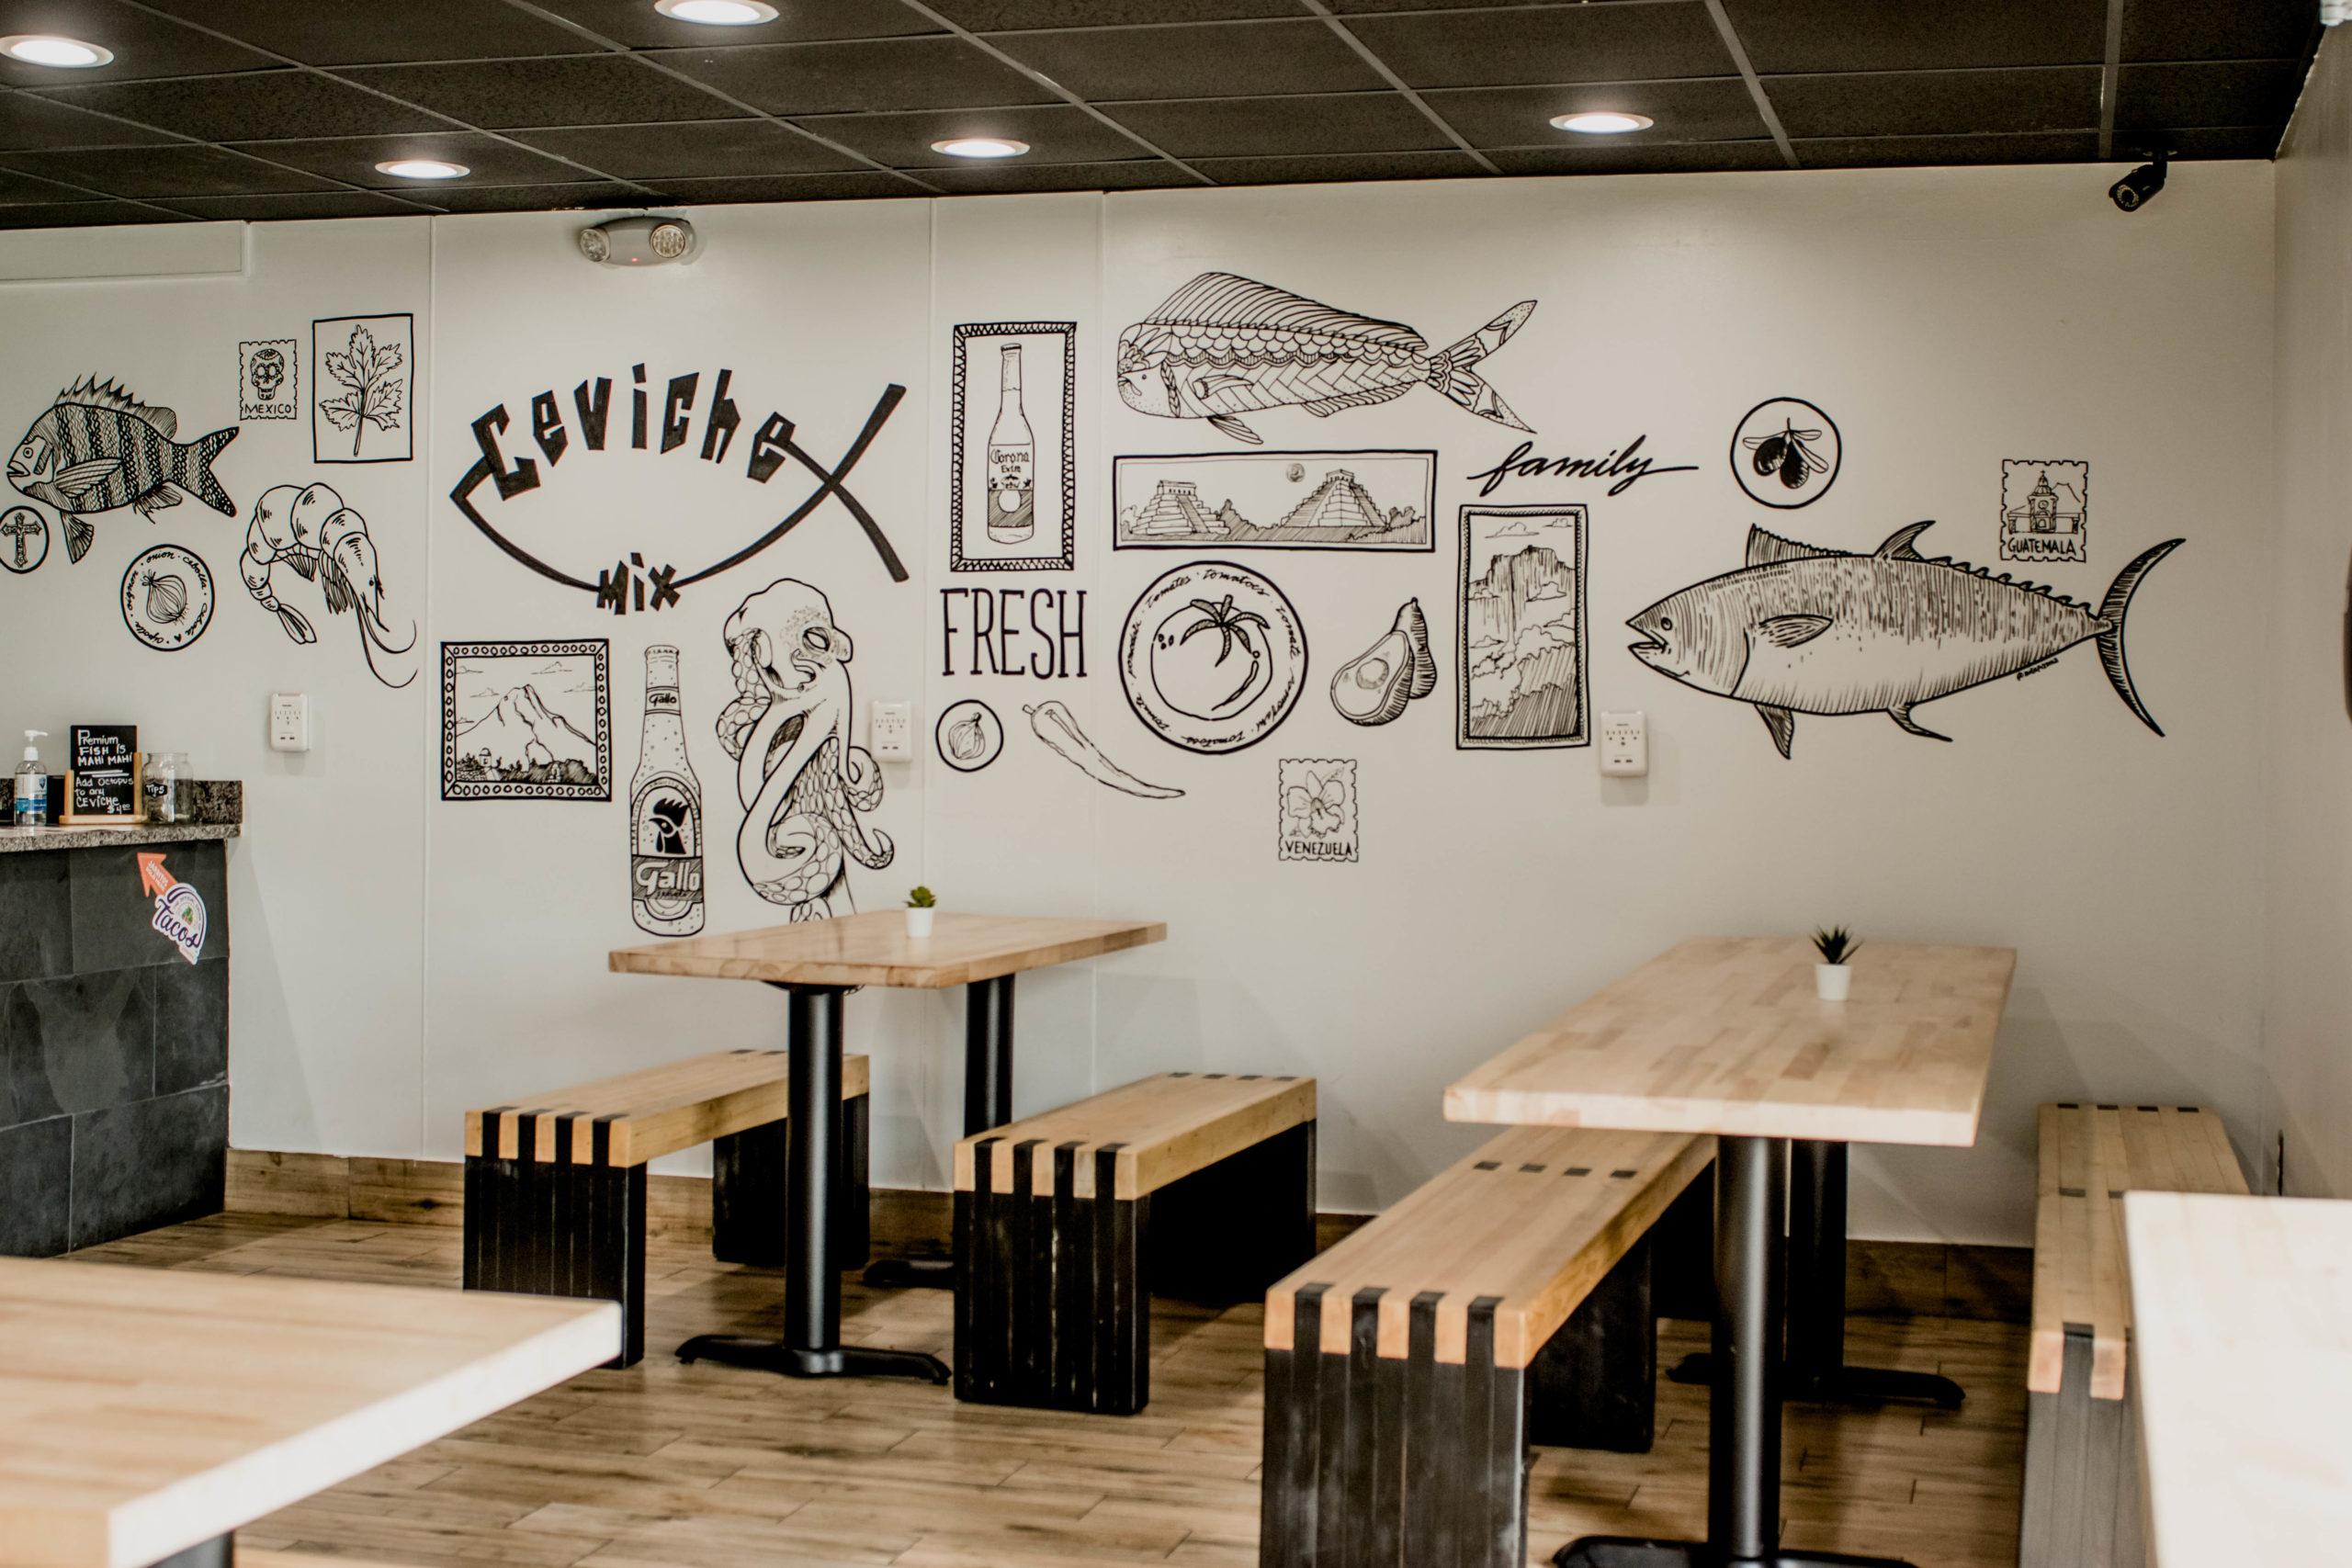 Interior mural at Ceviche Mix Winter Park.